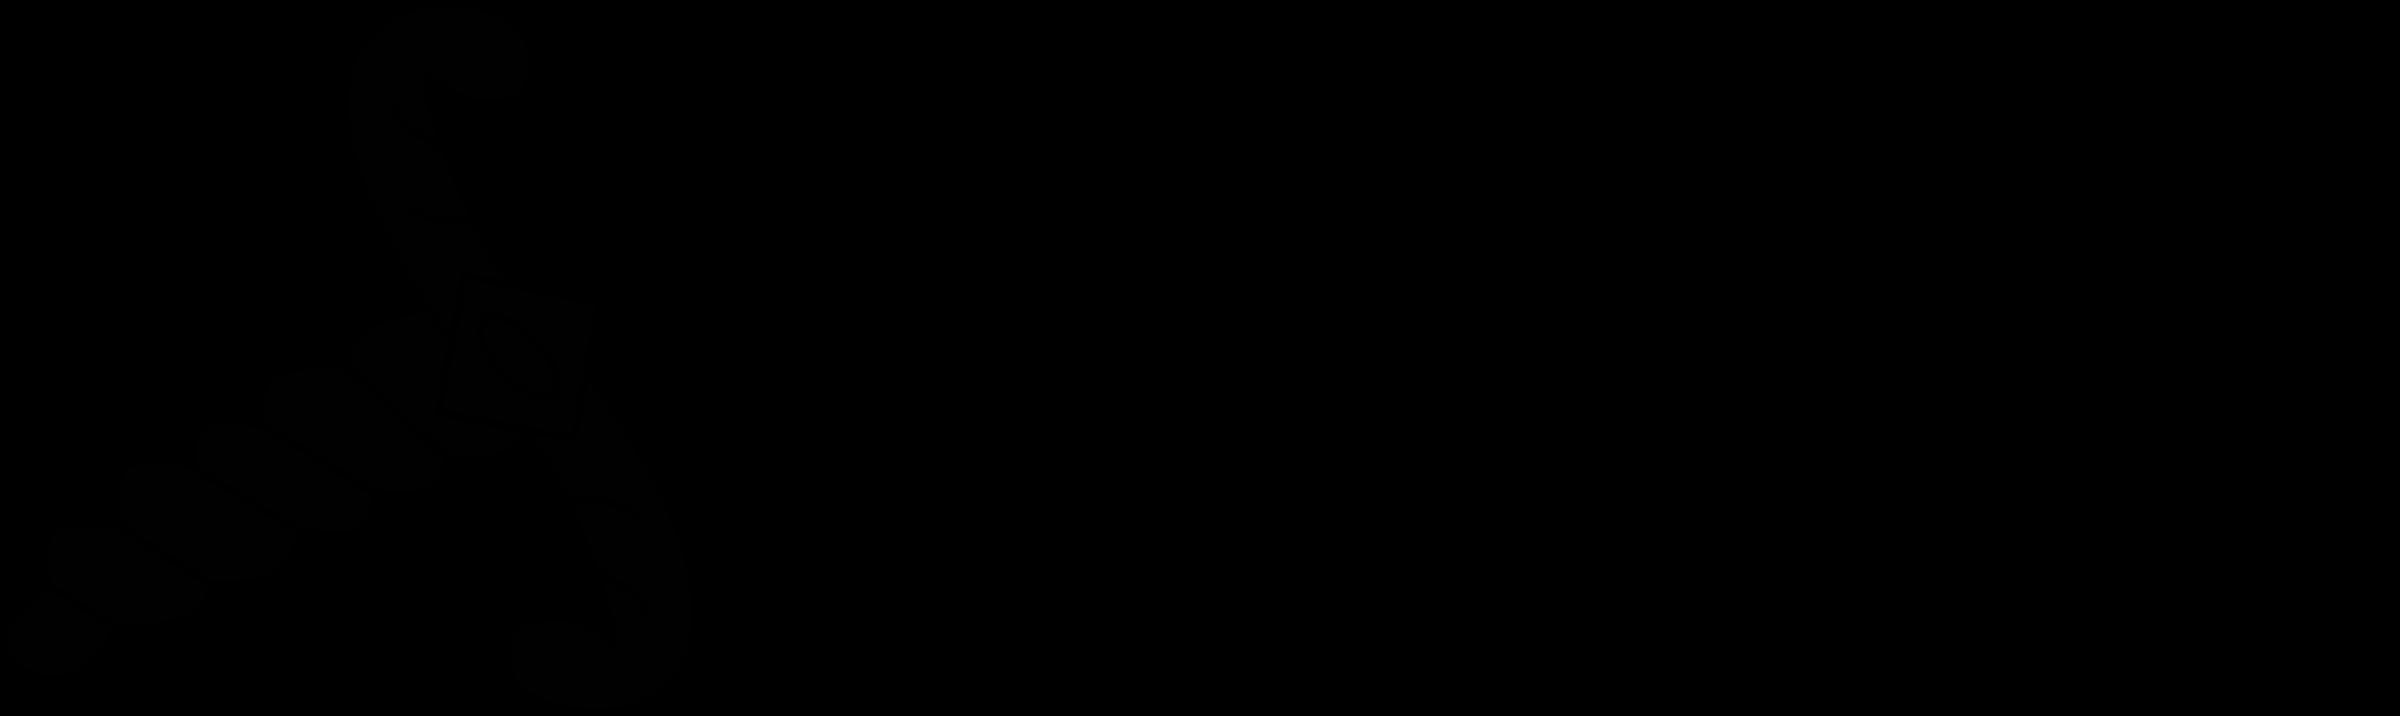 flag post icon X